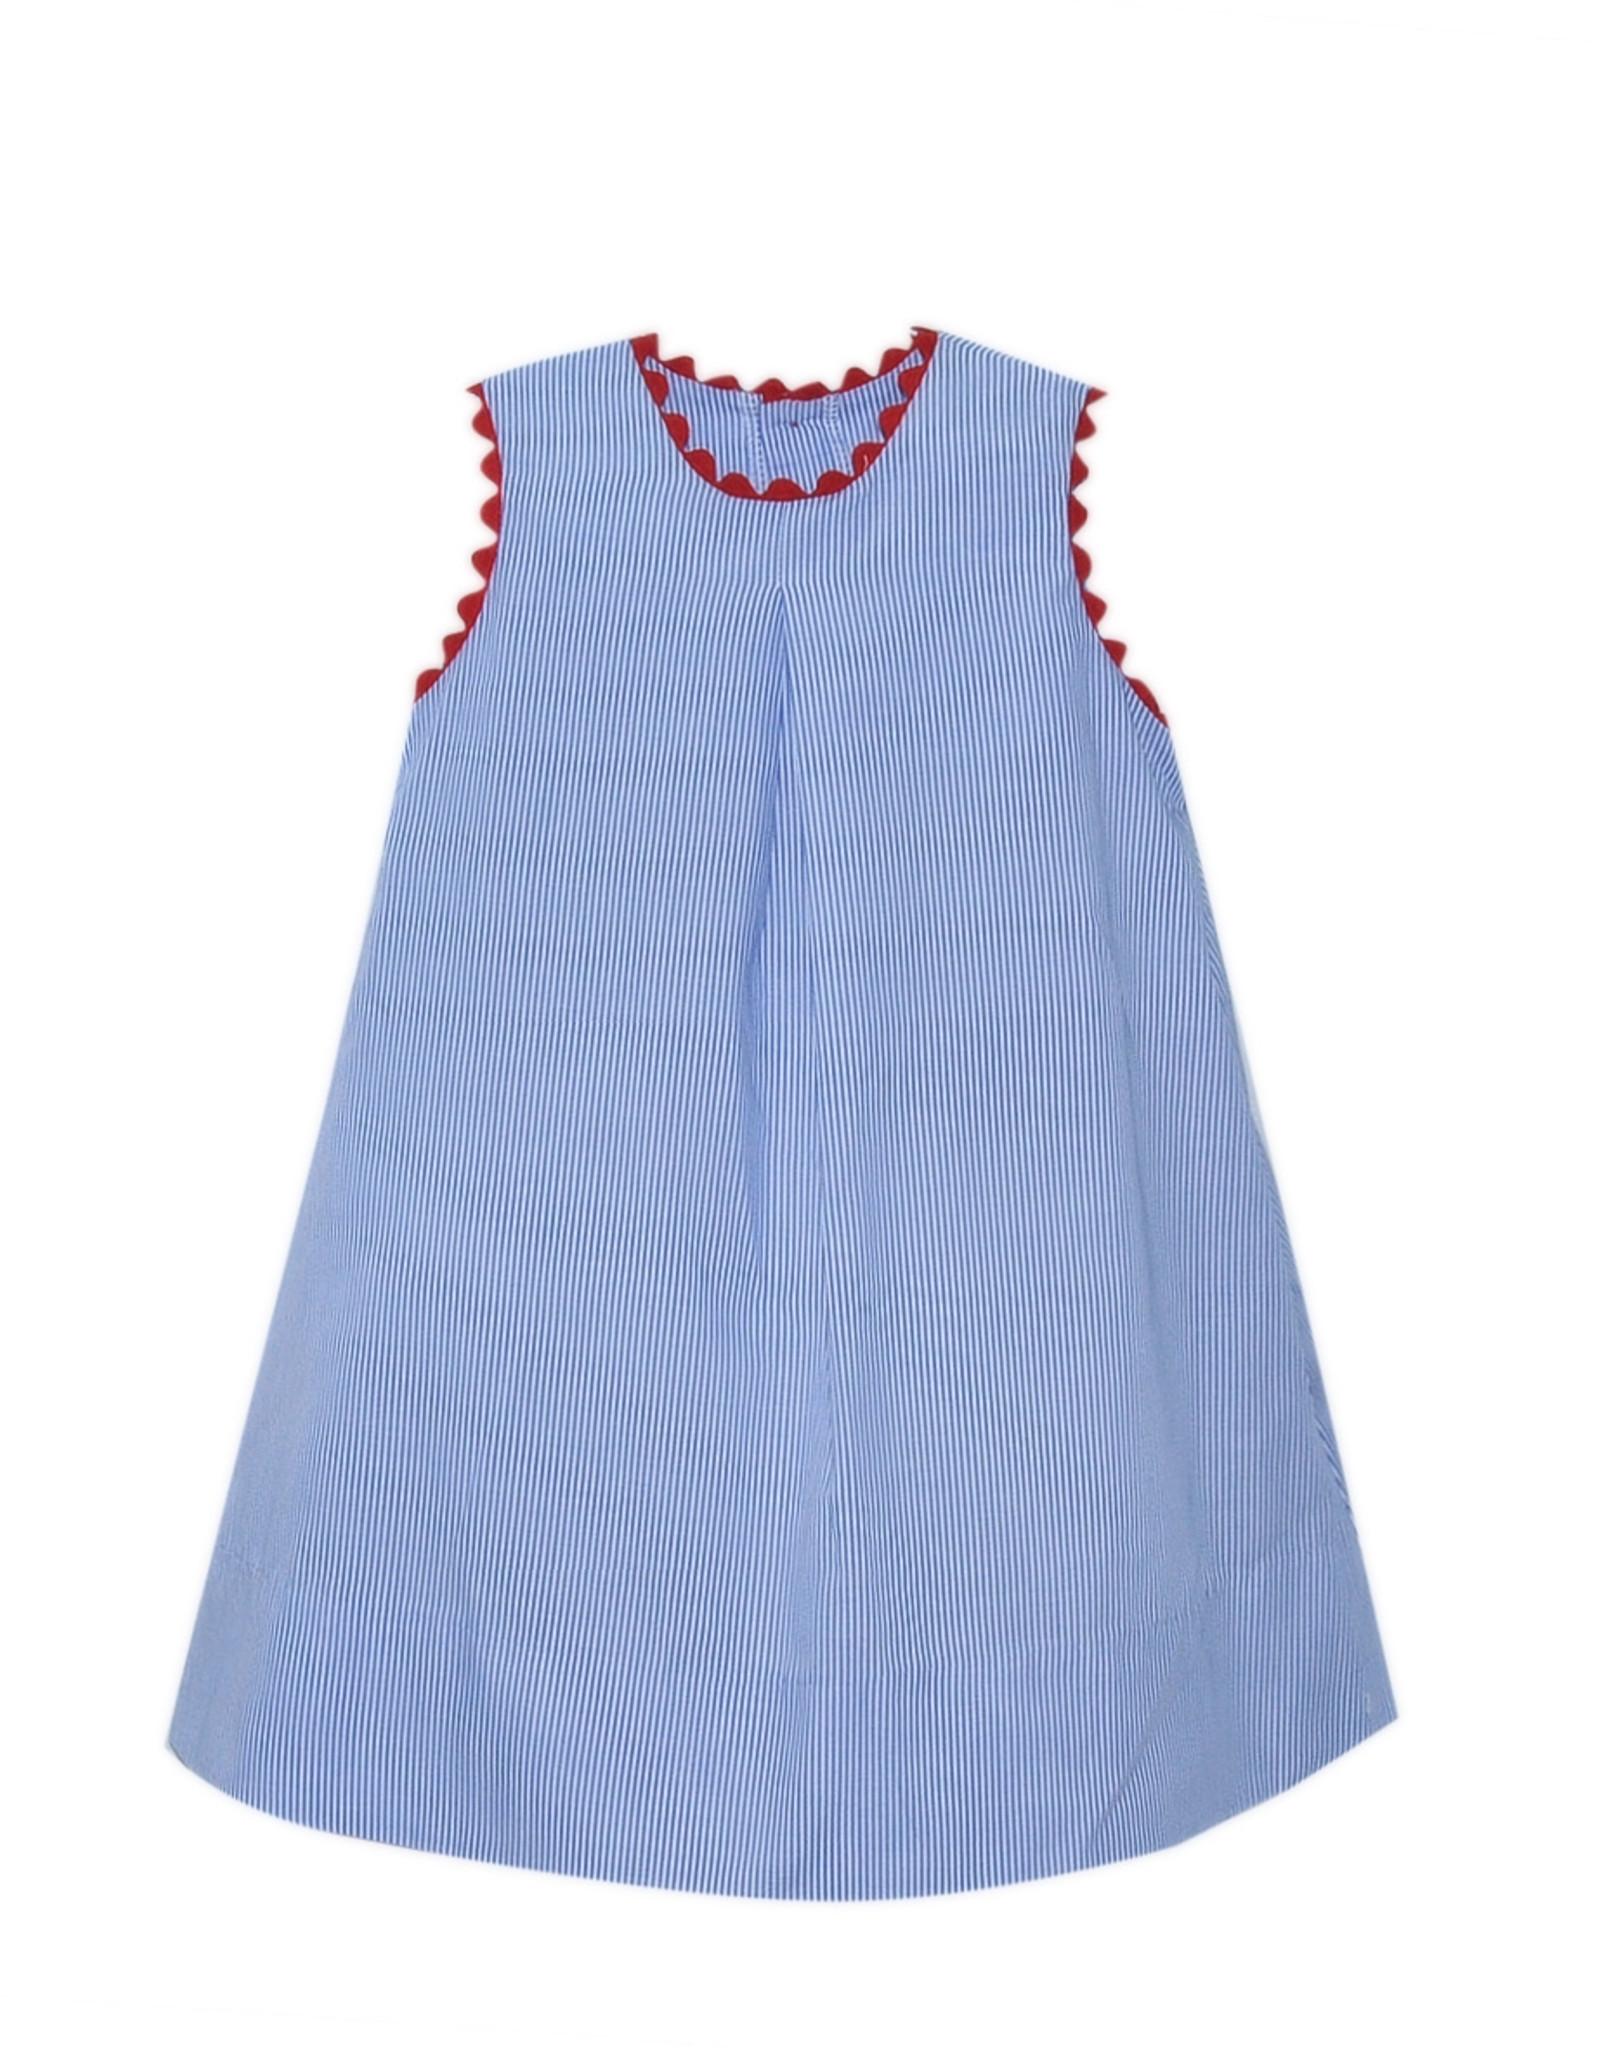 LullabySet Caroline Navy Striped Dress With Red Ric Rac